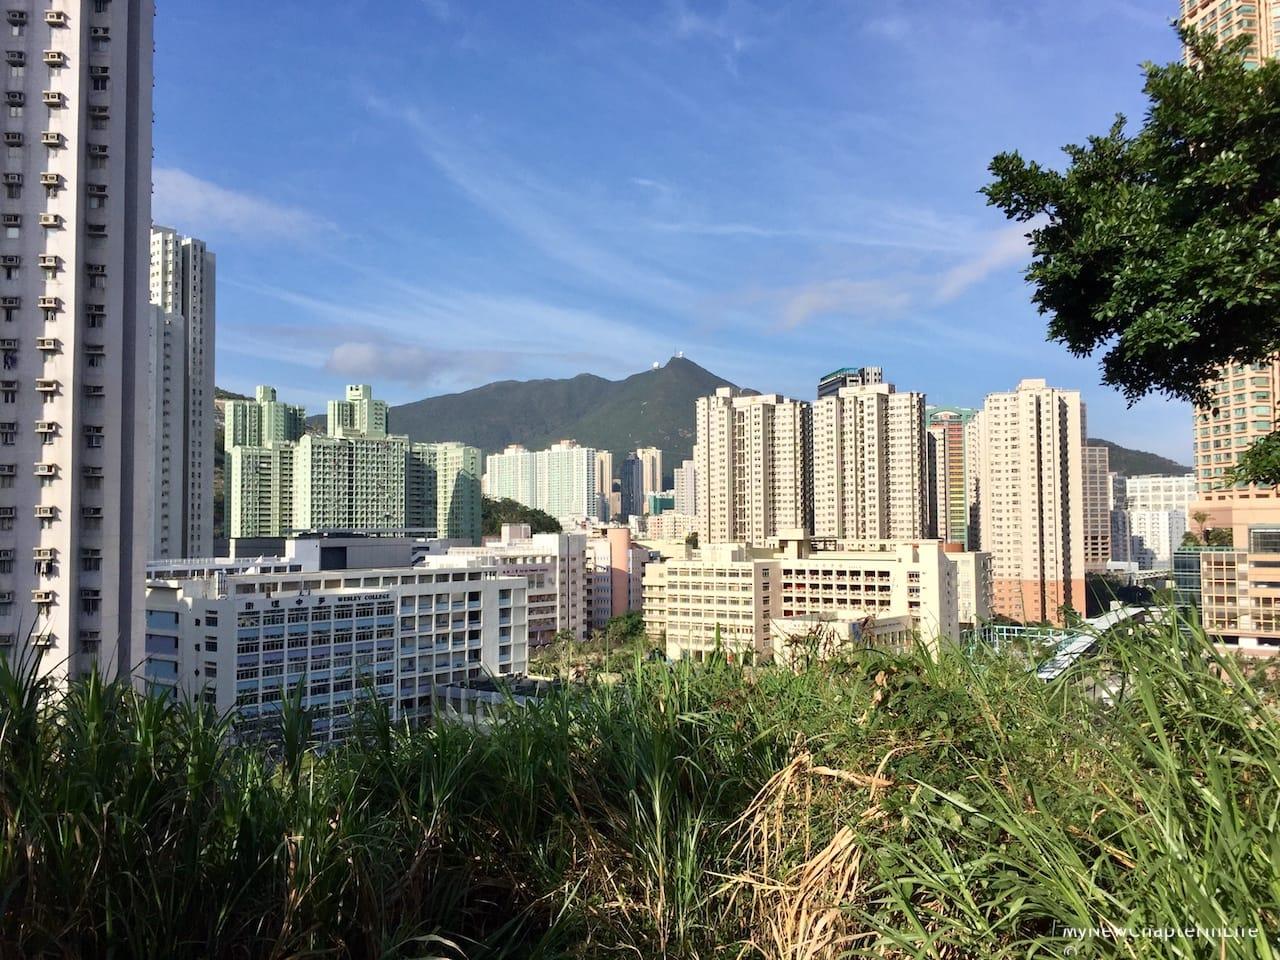 Government Public Housing Estate in Siu Sai Wan